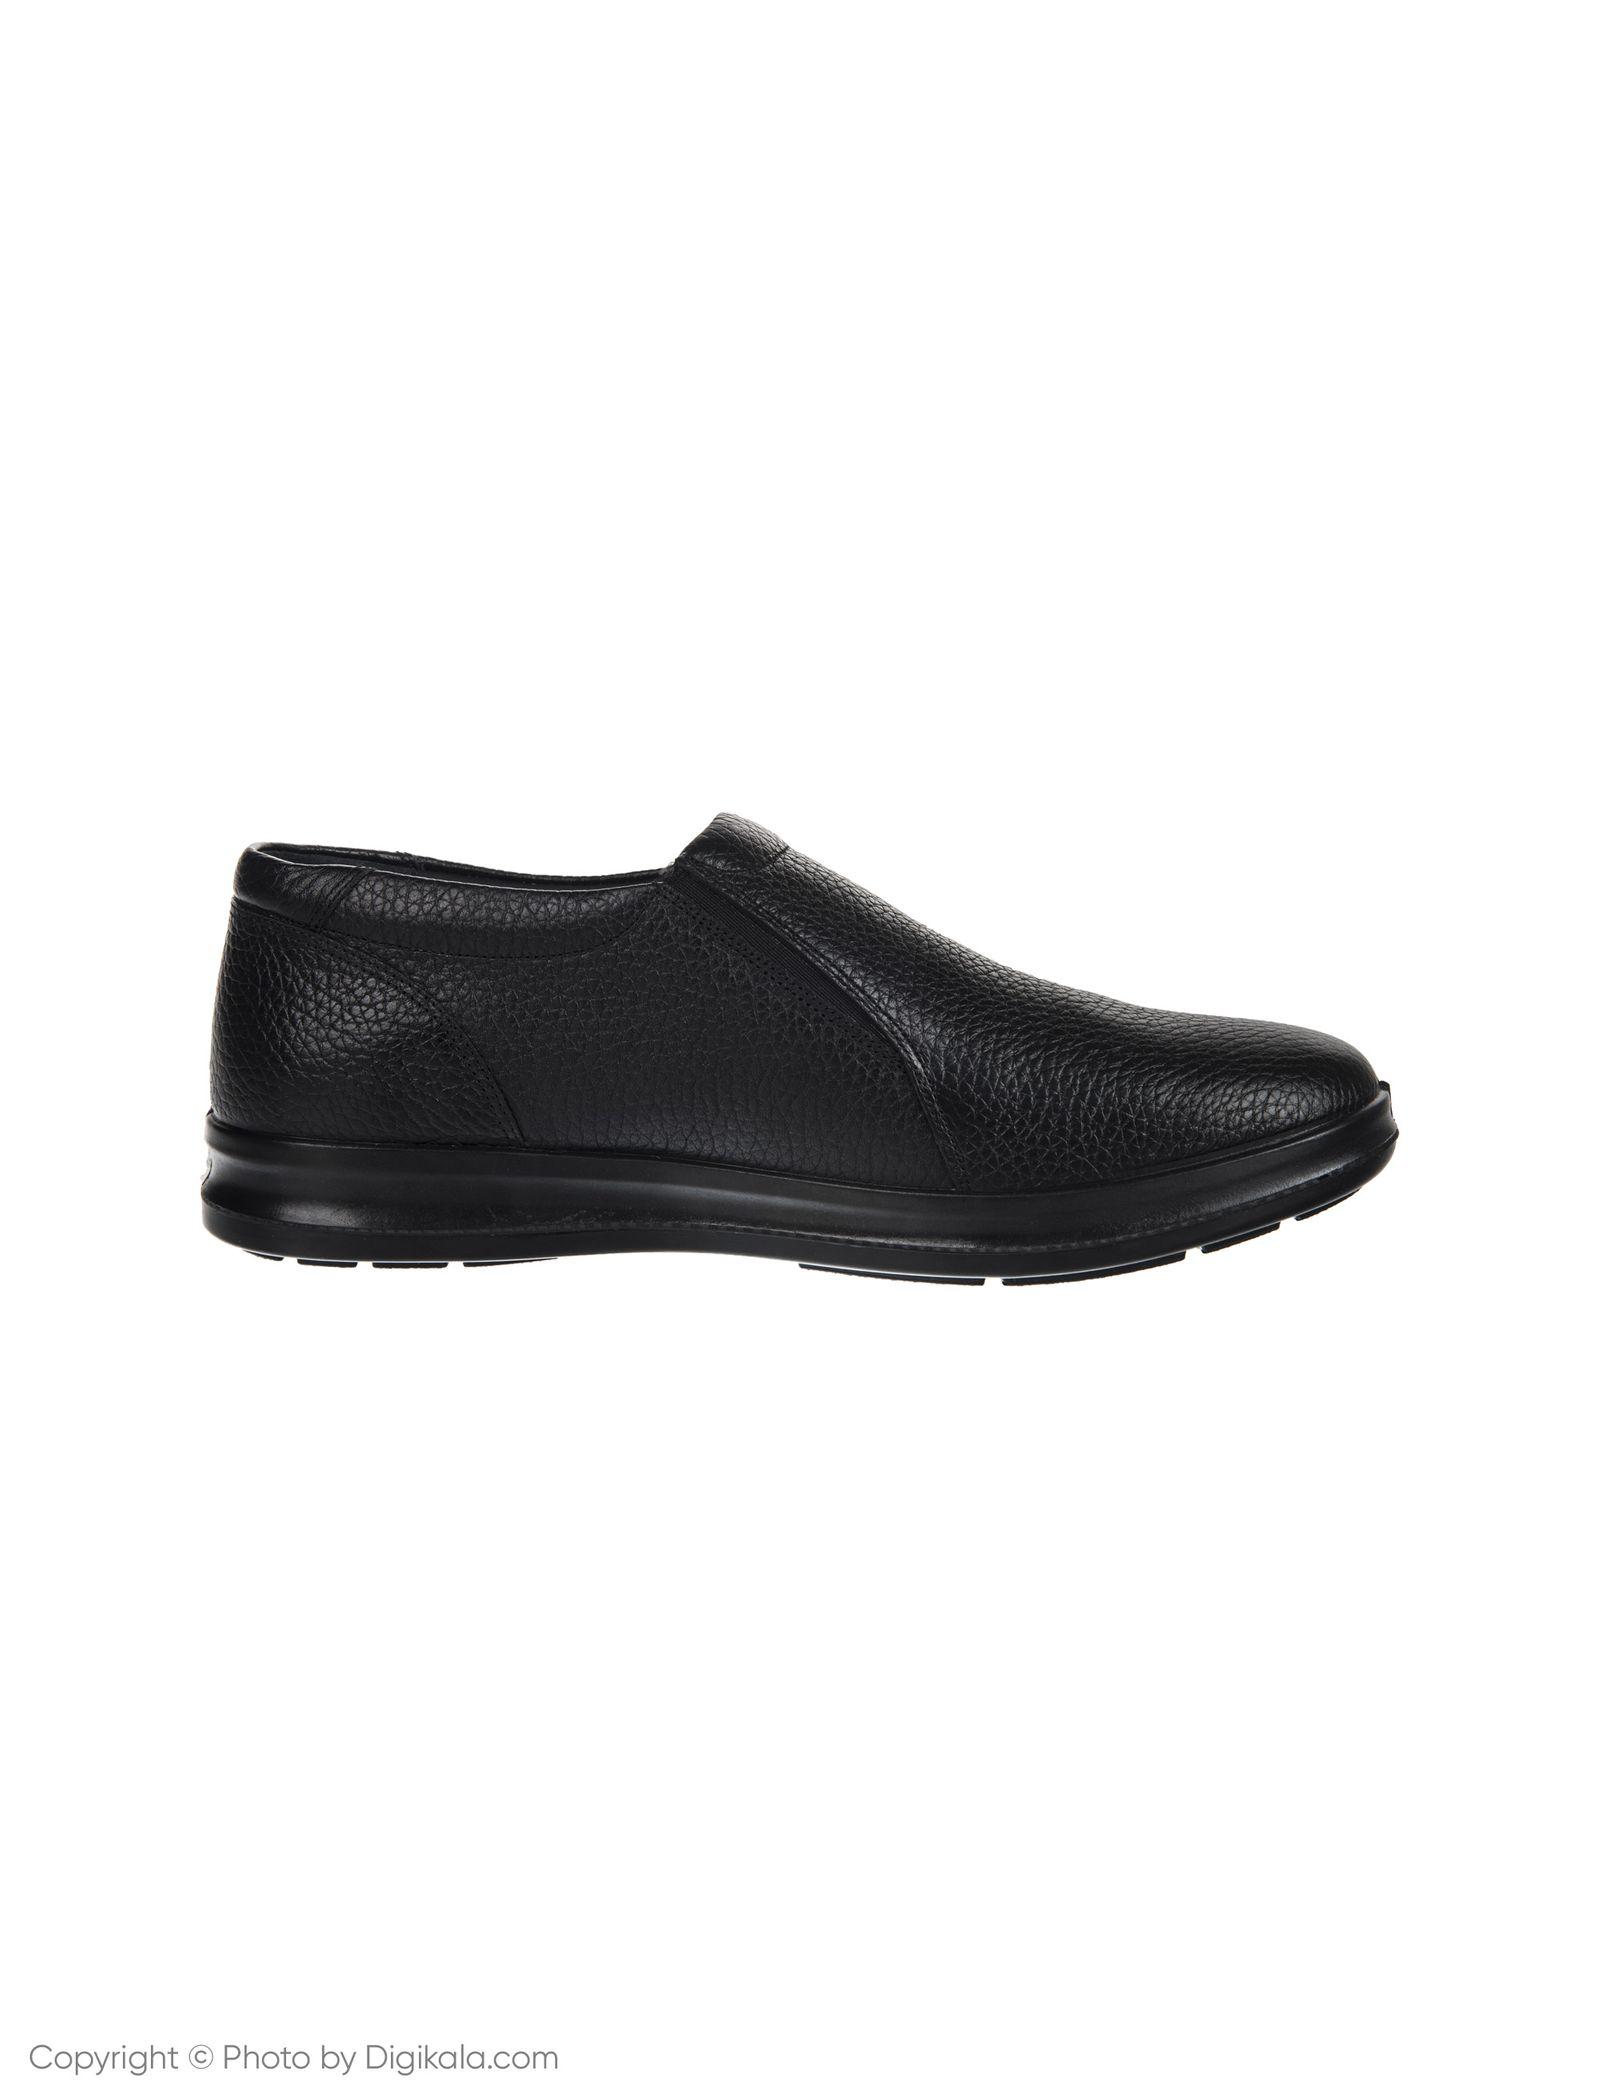 کفش مردانه دنیلی مدل 113110241002 -  - 3